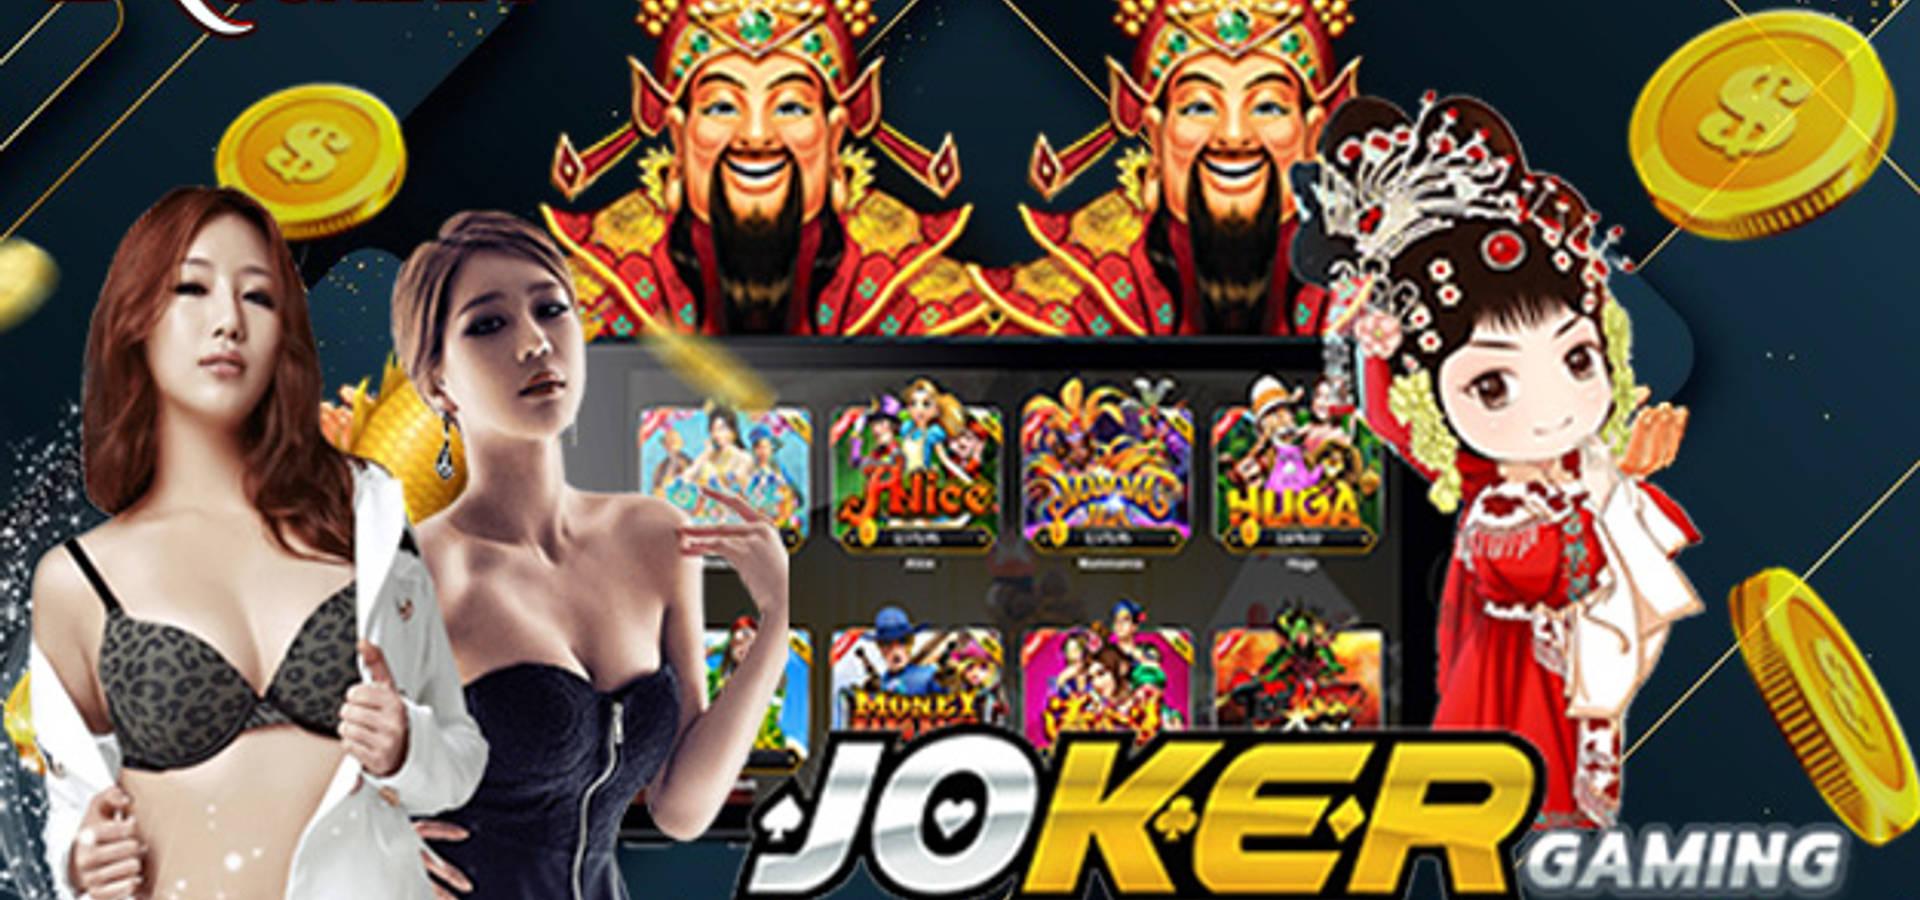 Agen Slot Online Slot Deposit Pulsa Pragmatic Play Slot Roma Joker123 Joker Gaming Spade Gaming Cq9